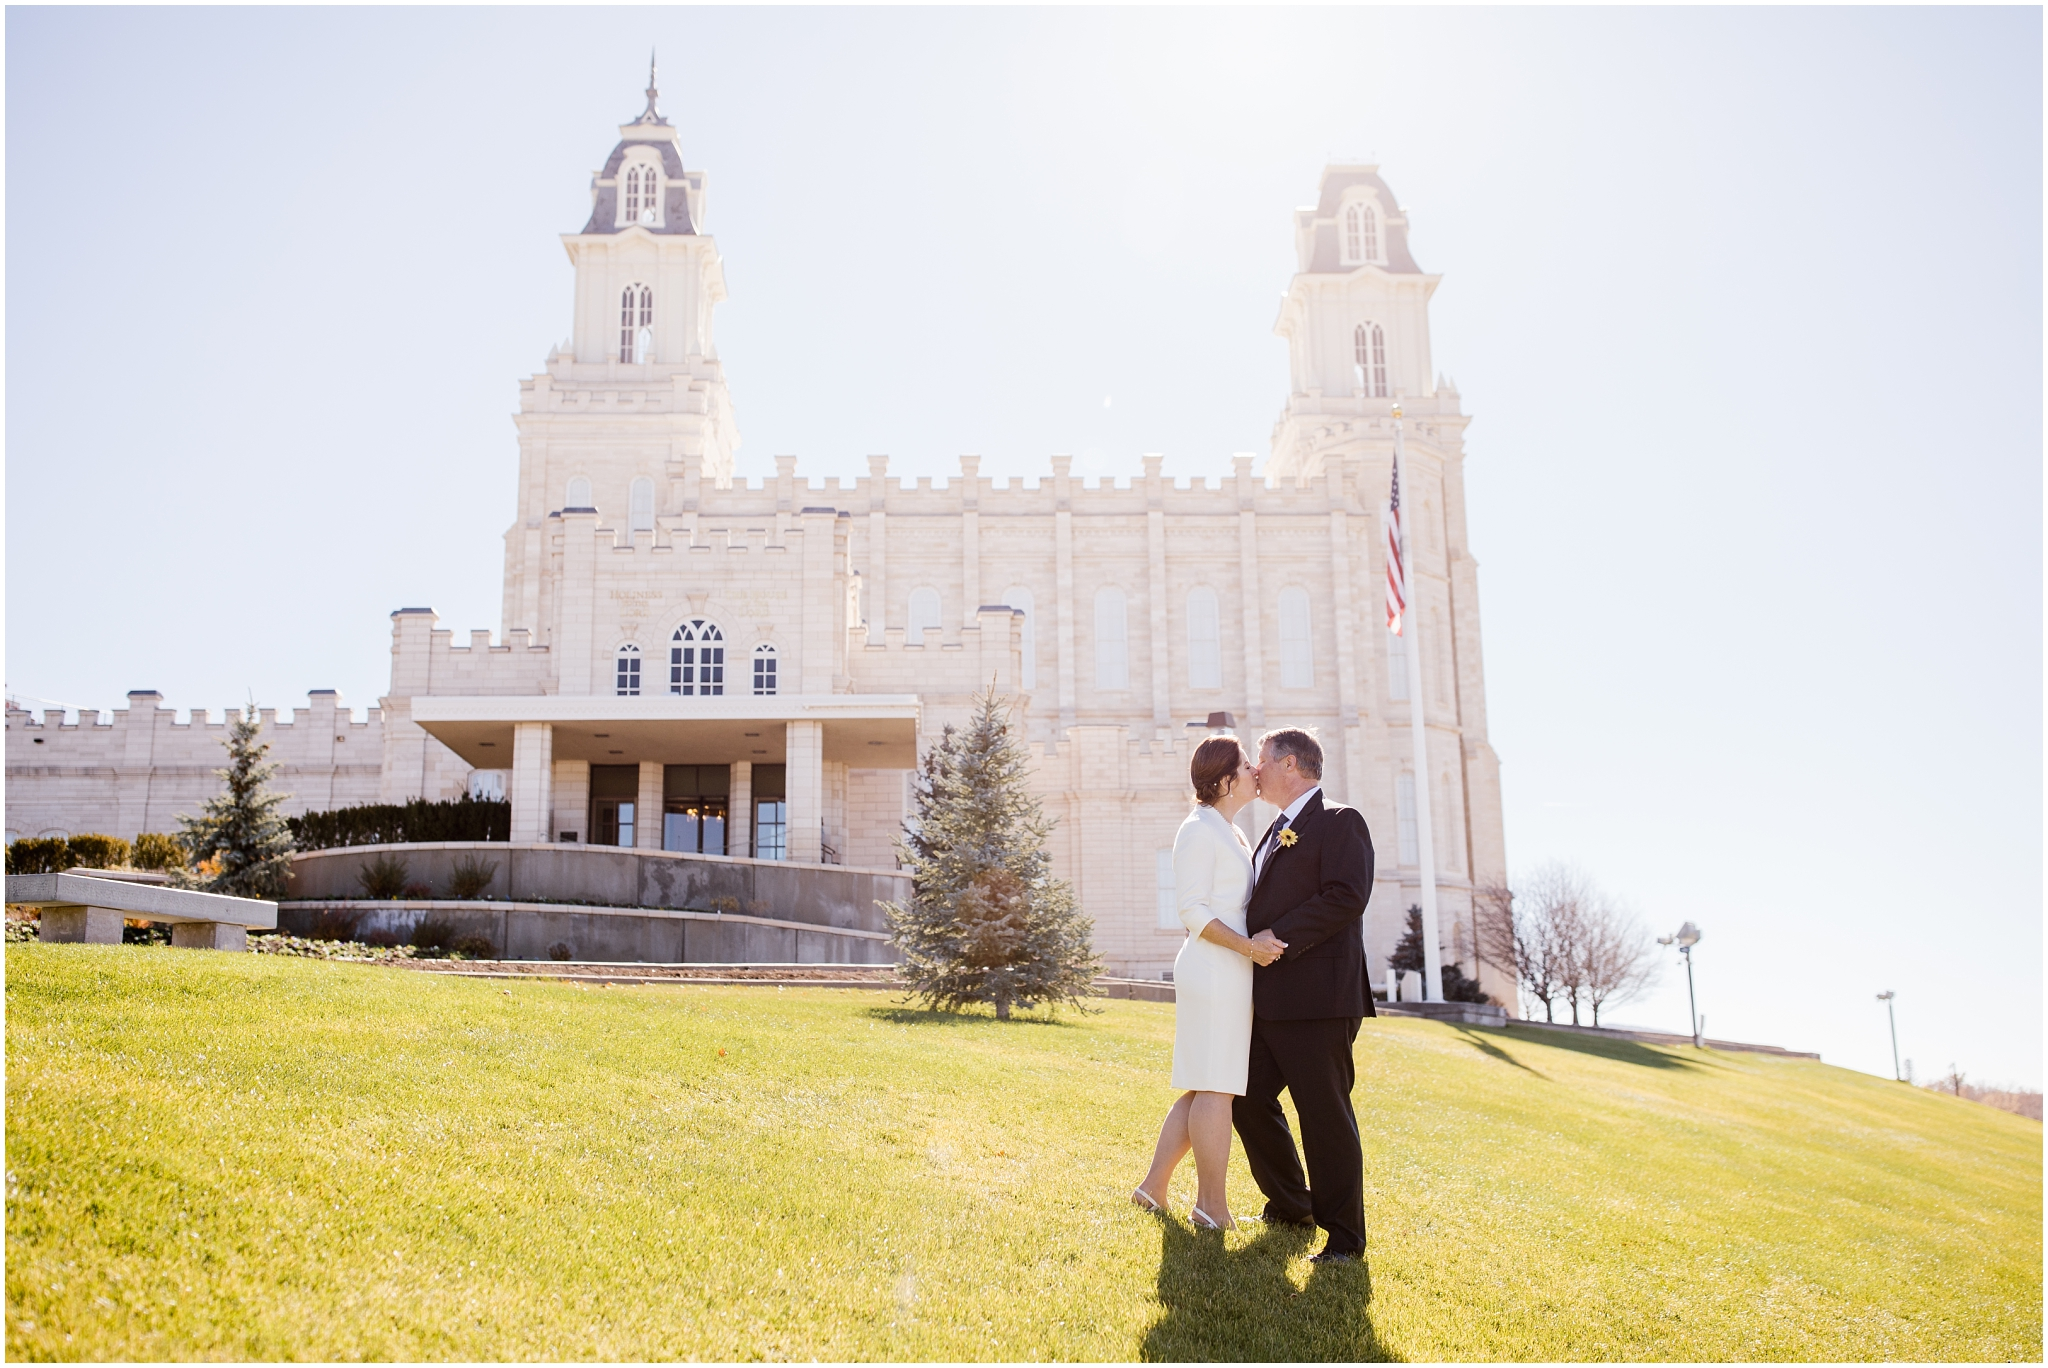 PDWeddingDay-138_Lizzie-B-Imagery-Utah-Wedding-Photographer-Salt-Lake-City-Park-City-Utah-County-Manti-Temple.jpg